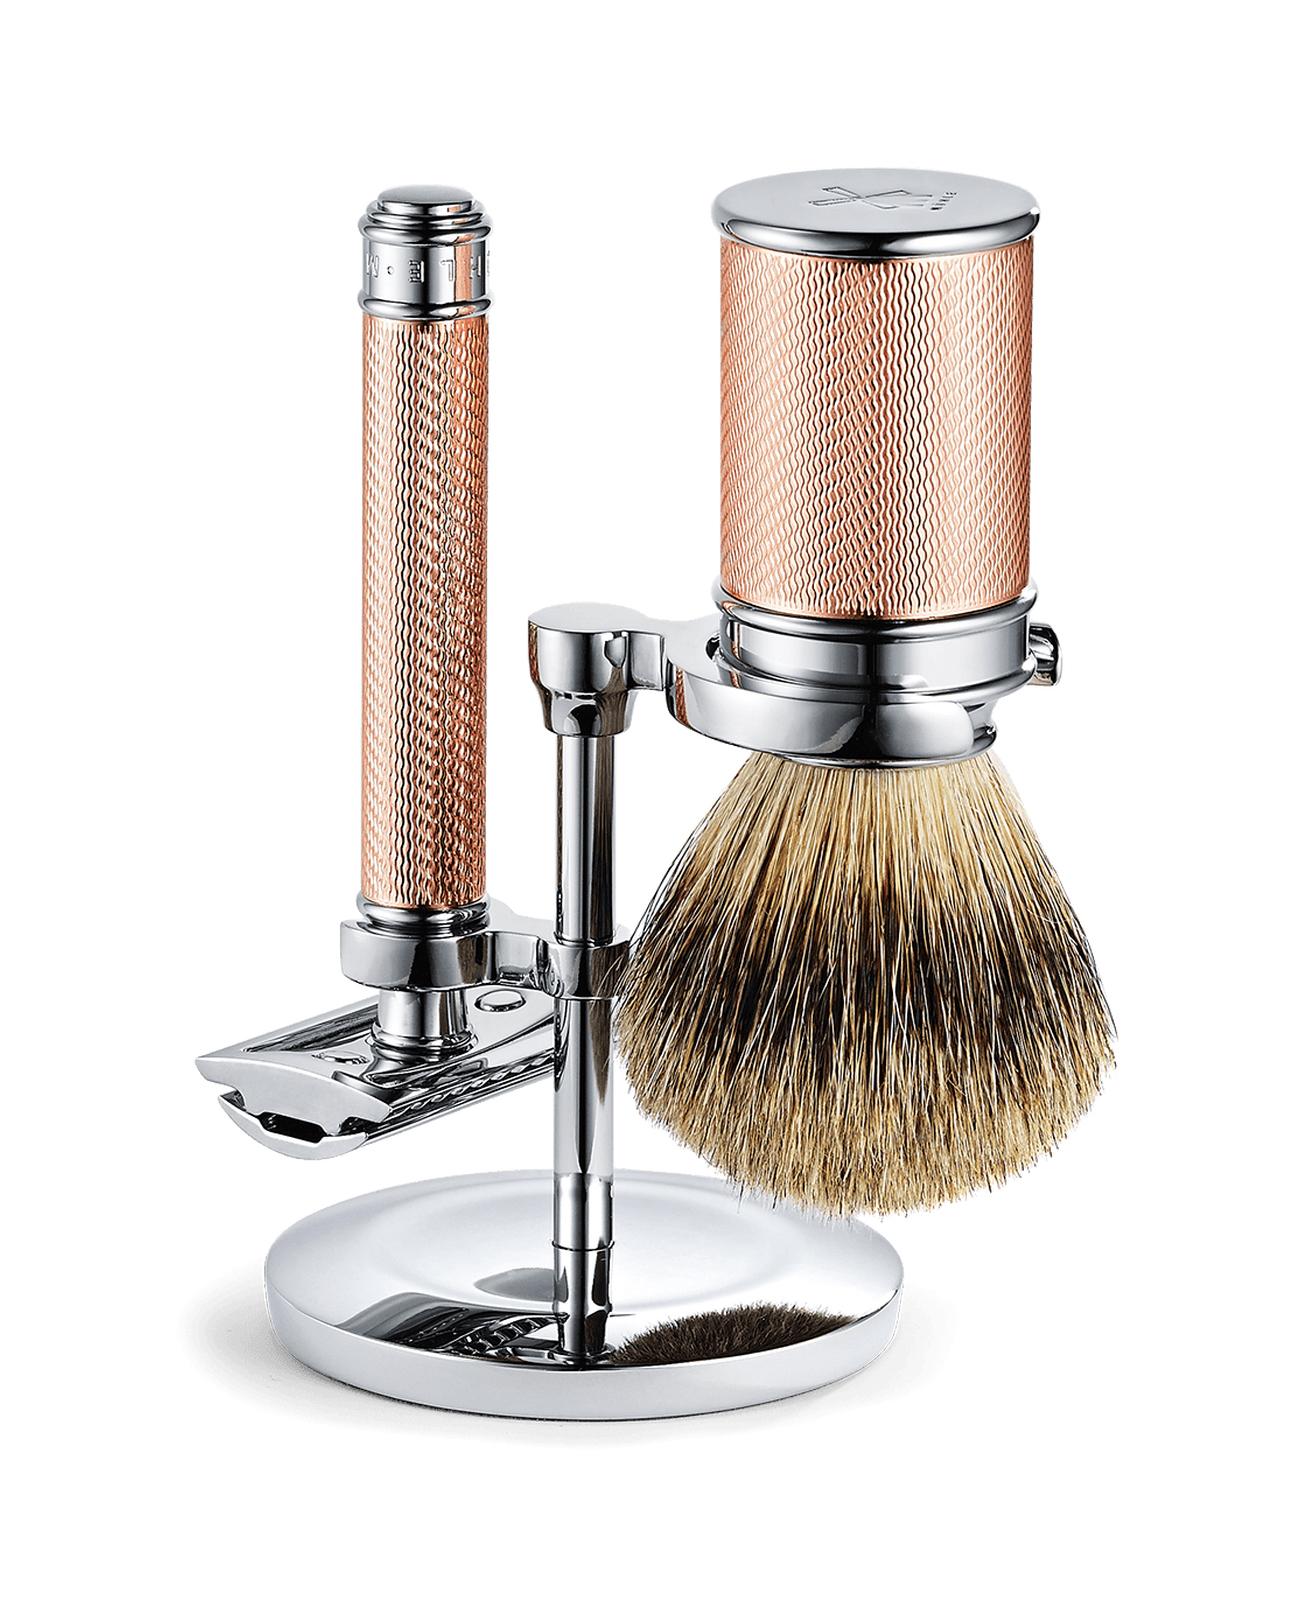 The Art of Shaving Safety Razor Shaving Stand